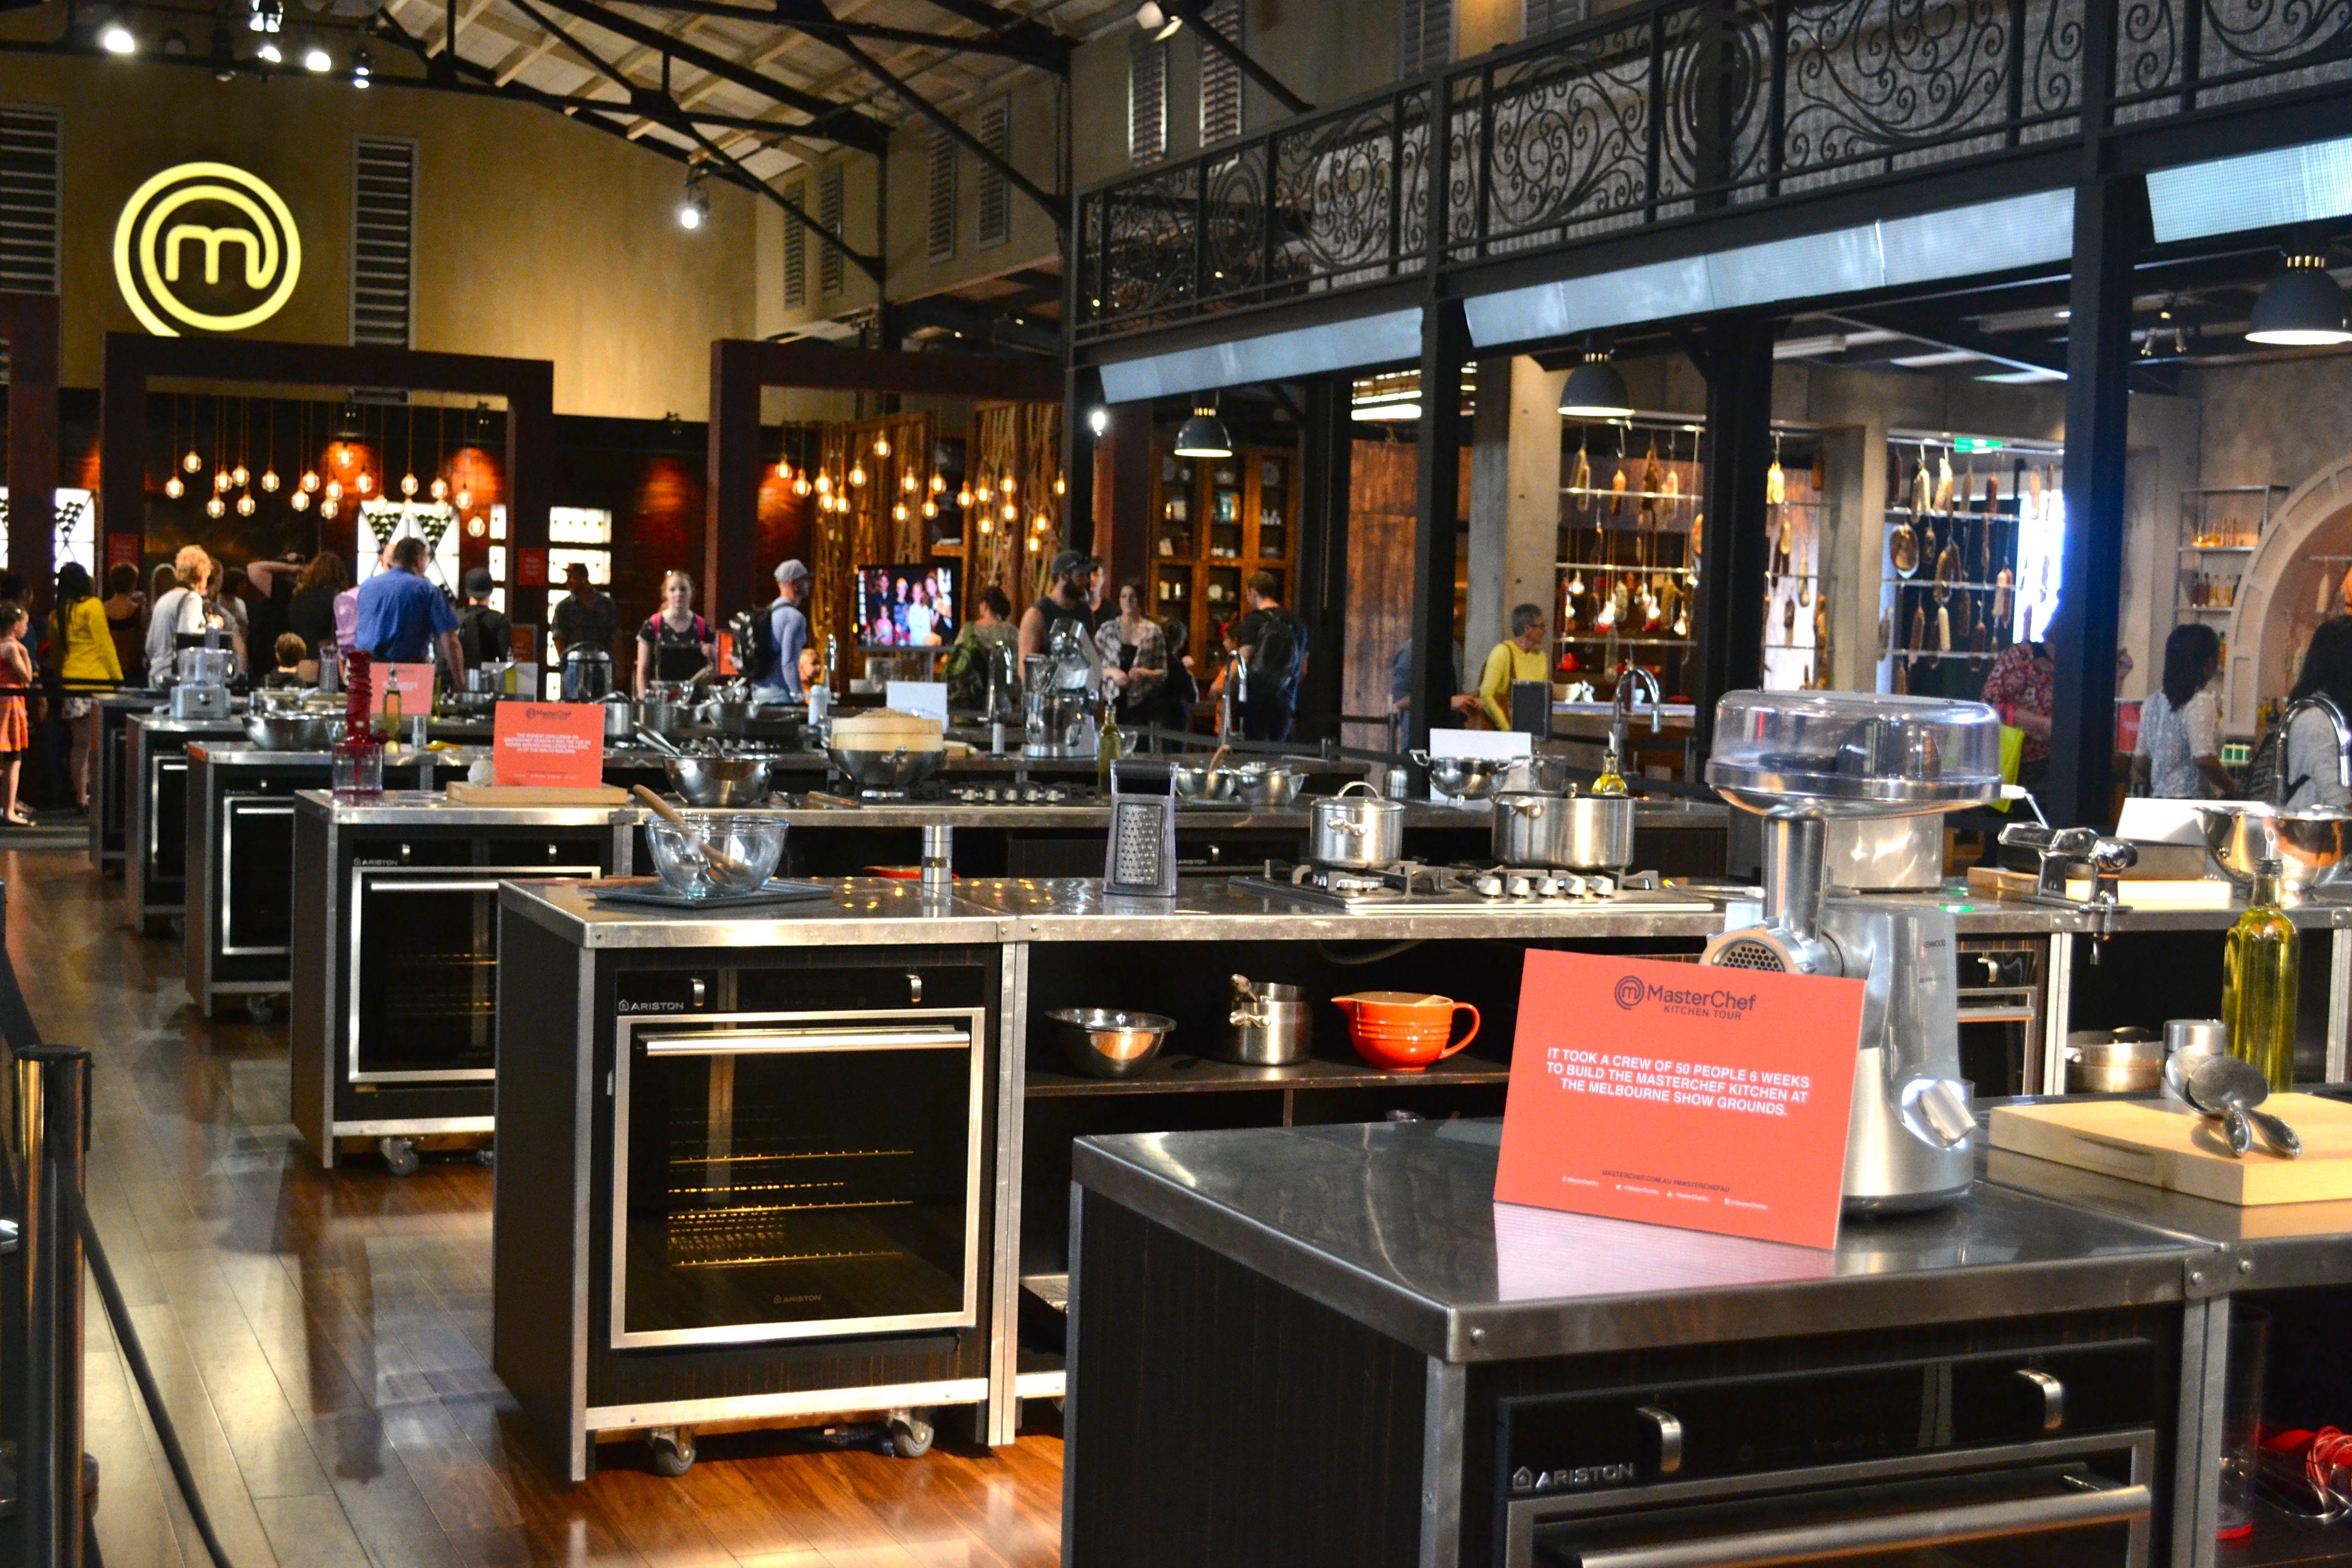 masterchef kitchen - Google Search | Mid-Victorian Remodel ...